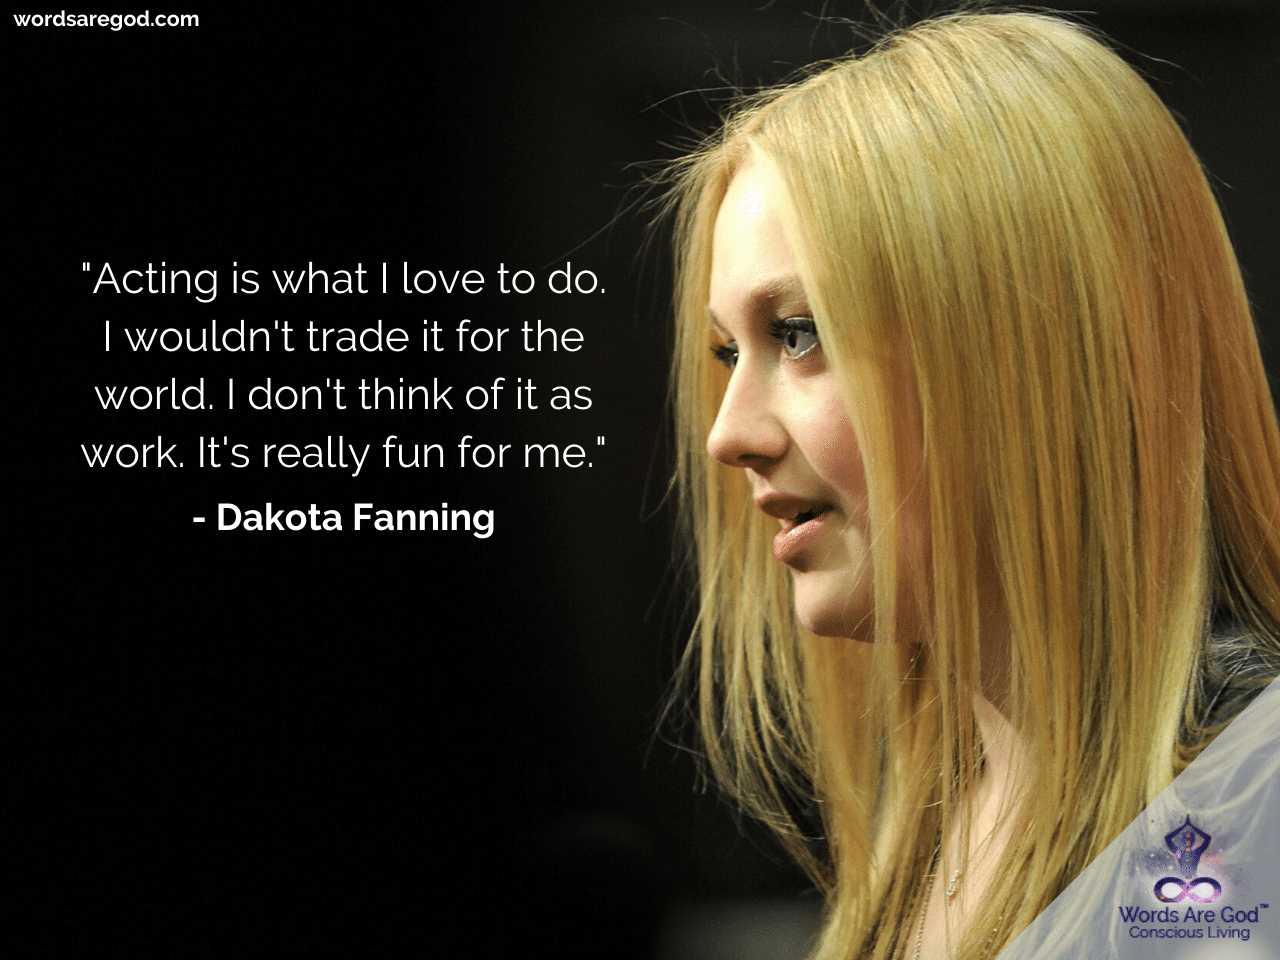 Dakota Fanning Motivational Quotes by Dakota Fanning